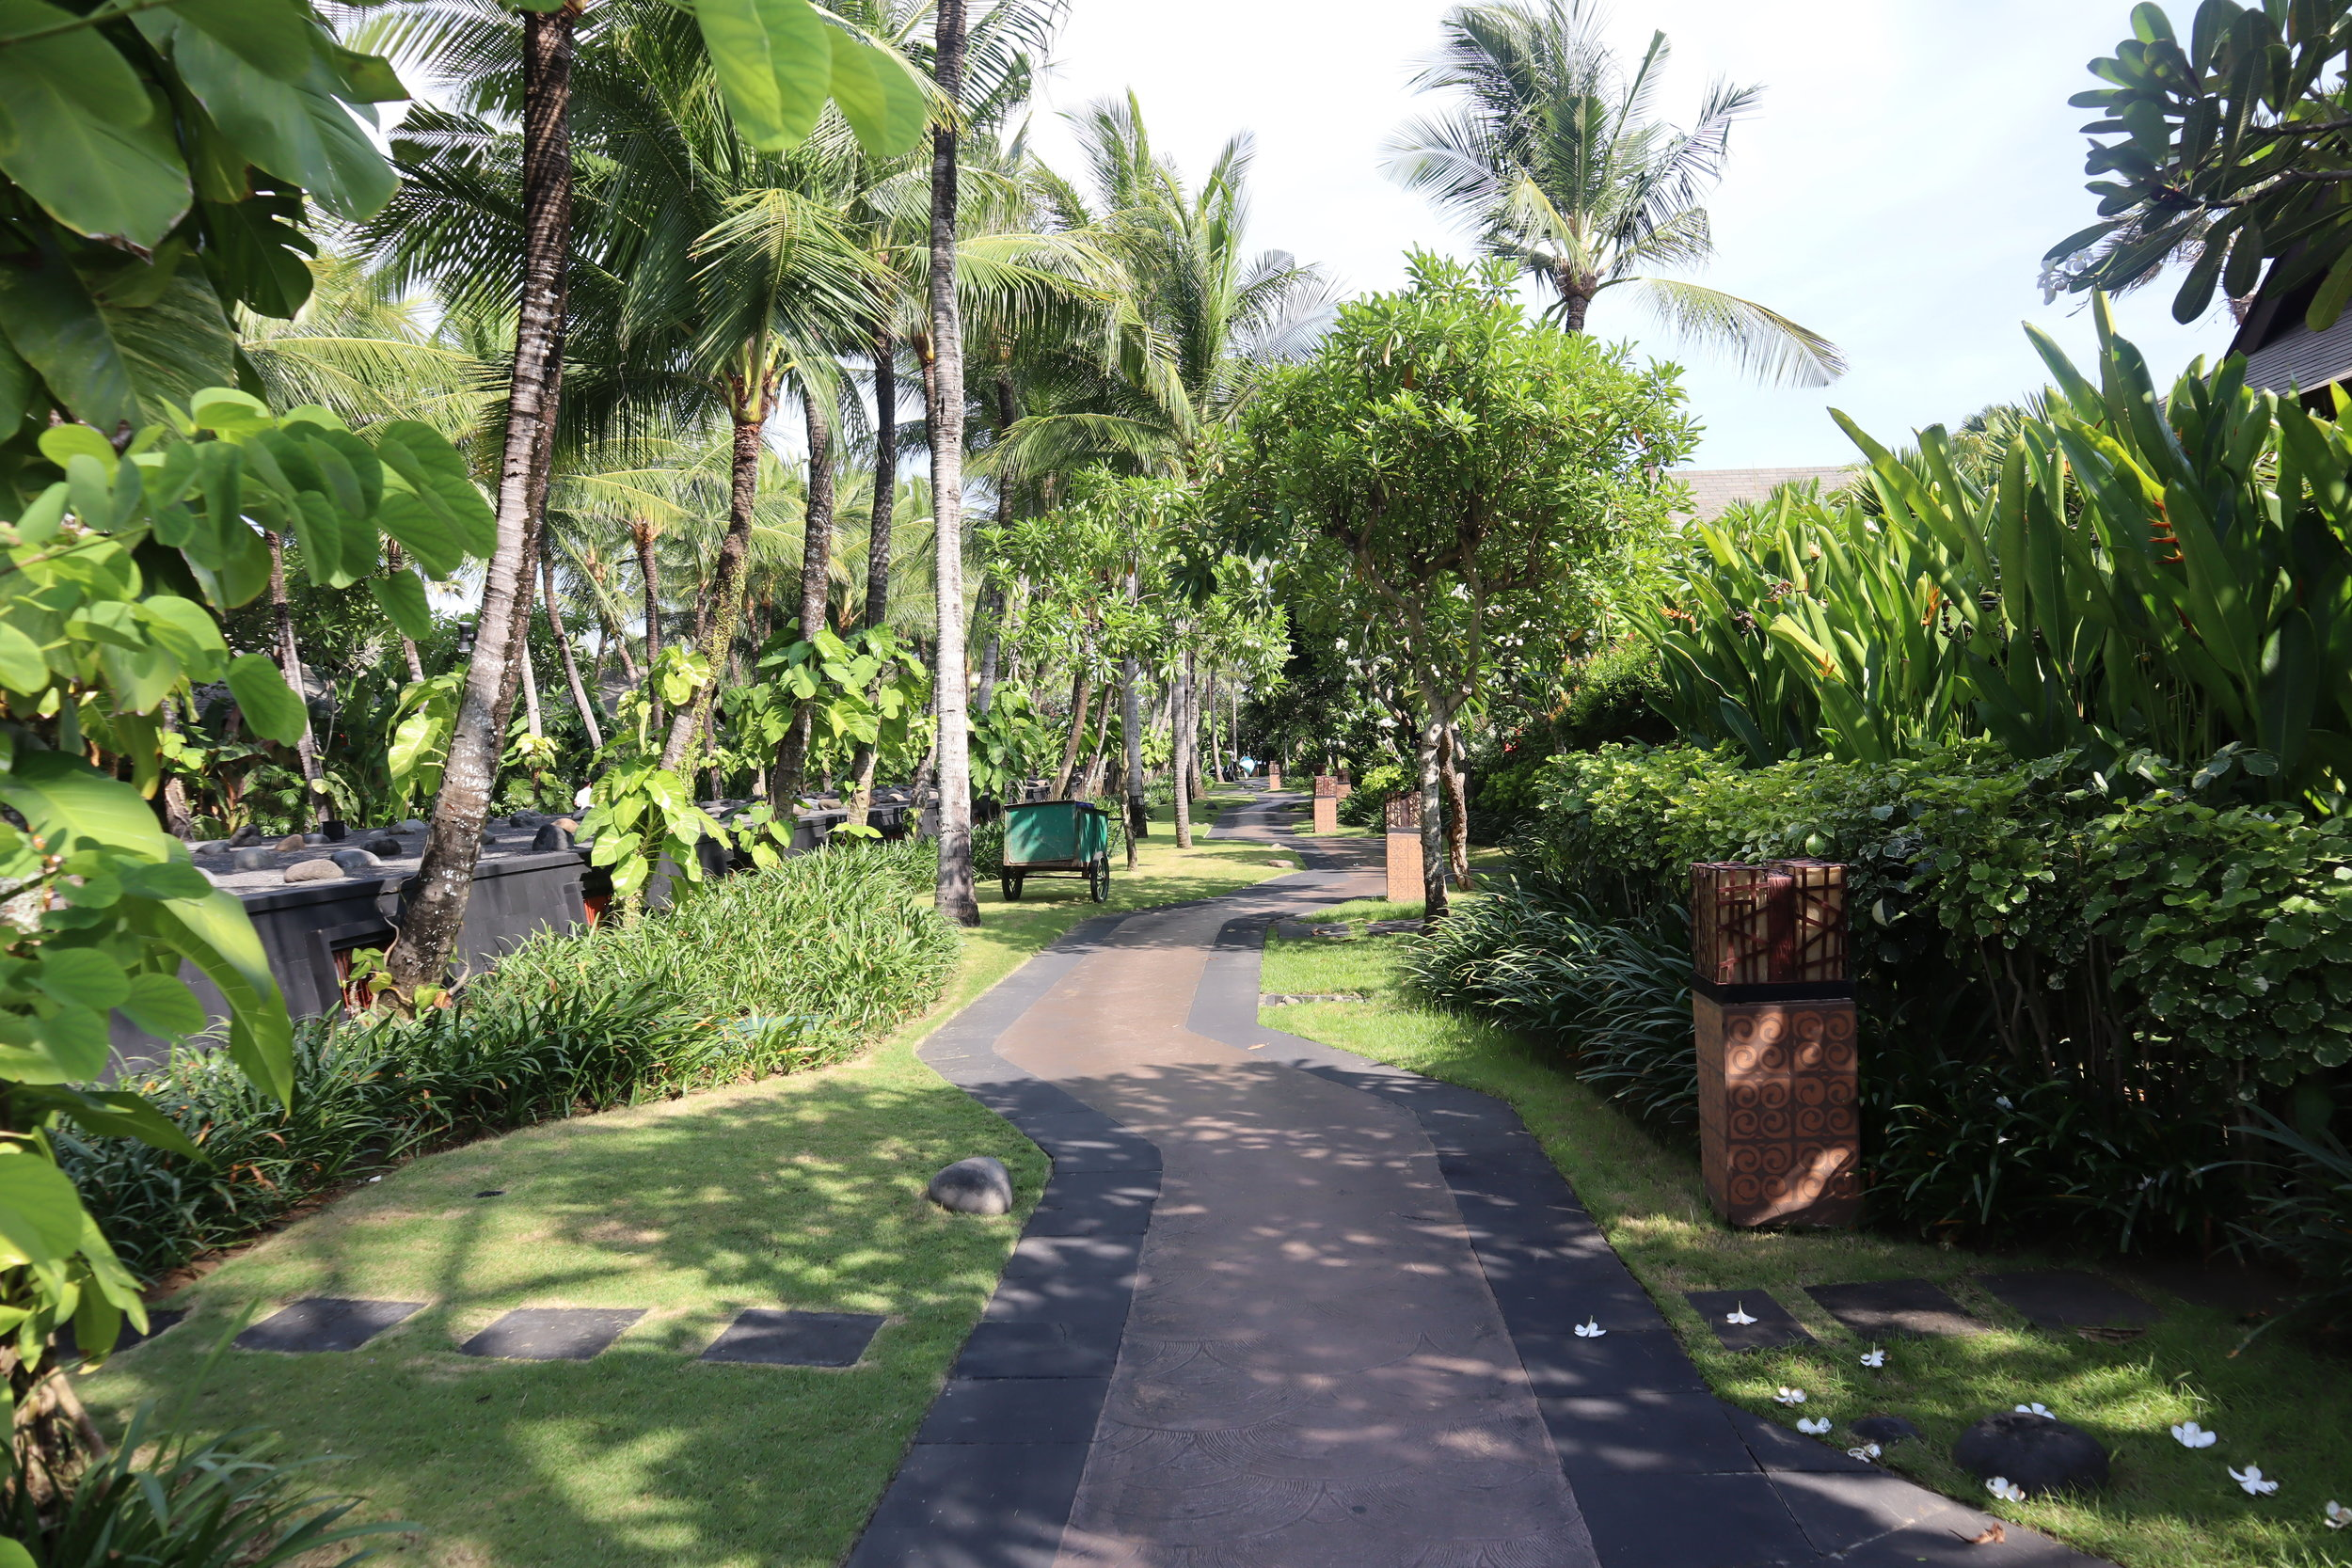 St. Regis Bali – Pathway